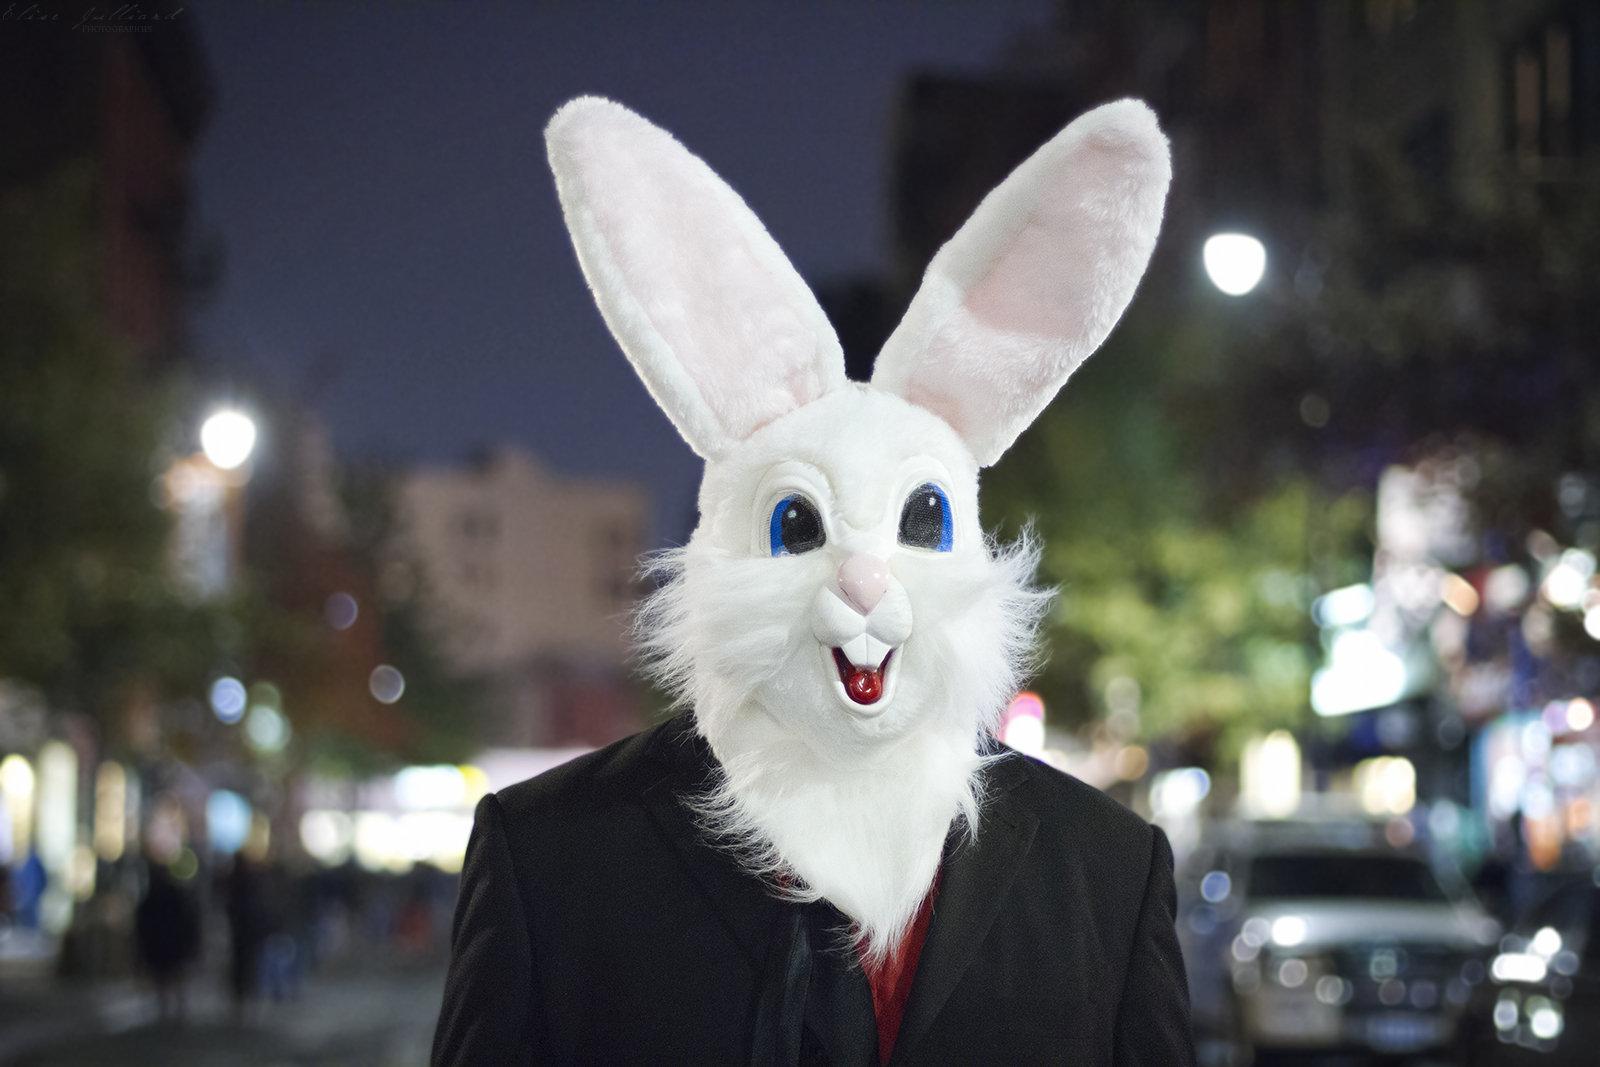 elise-julliard-photographe-photo-new-york-usa-etats-unis-amerique-halloween